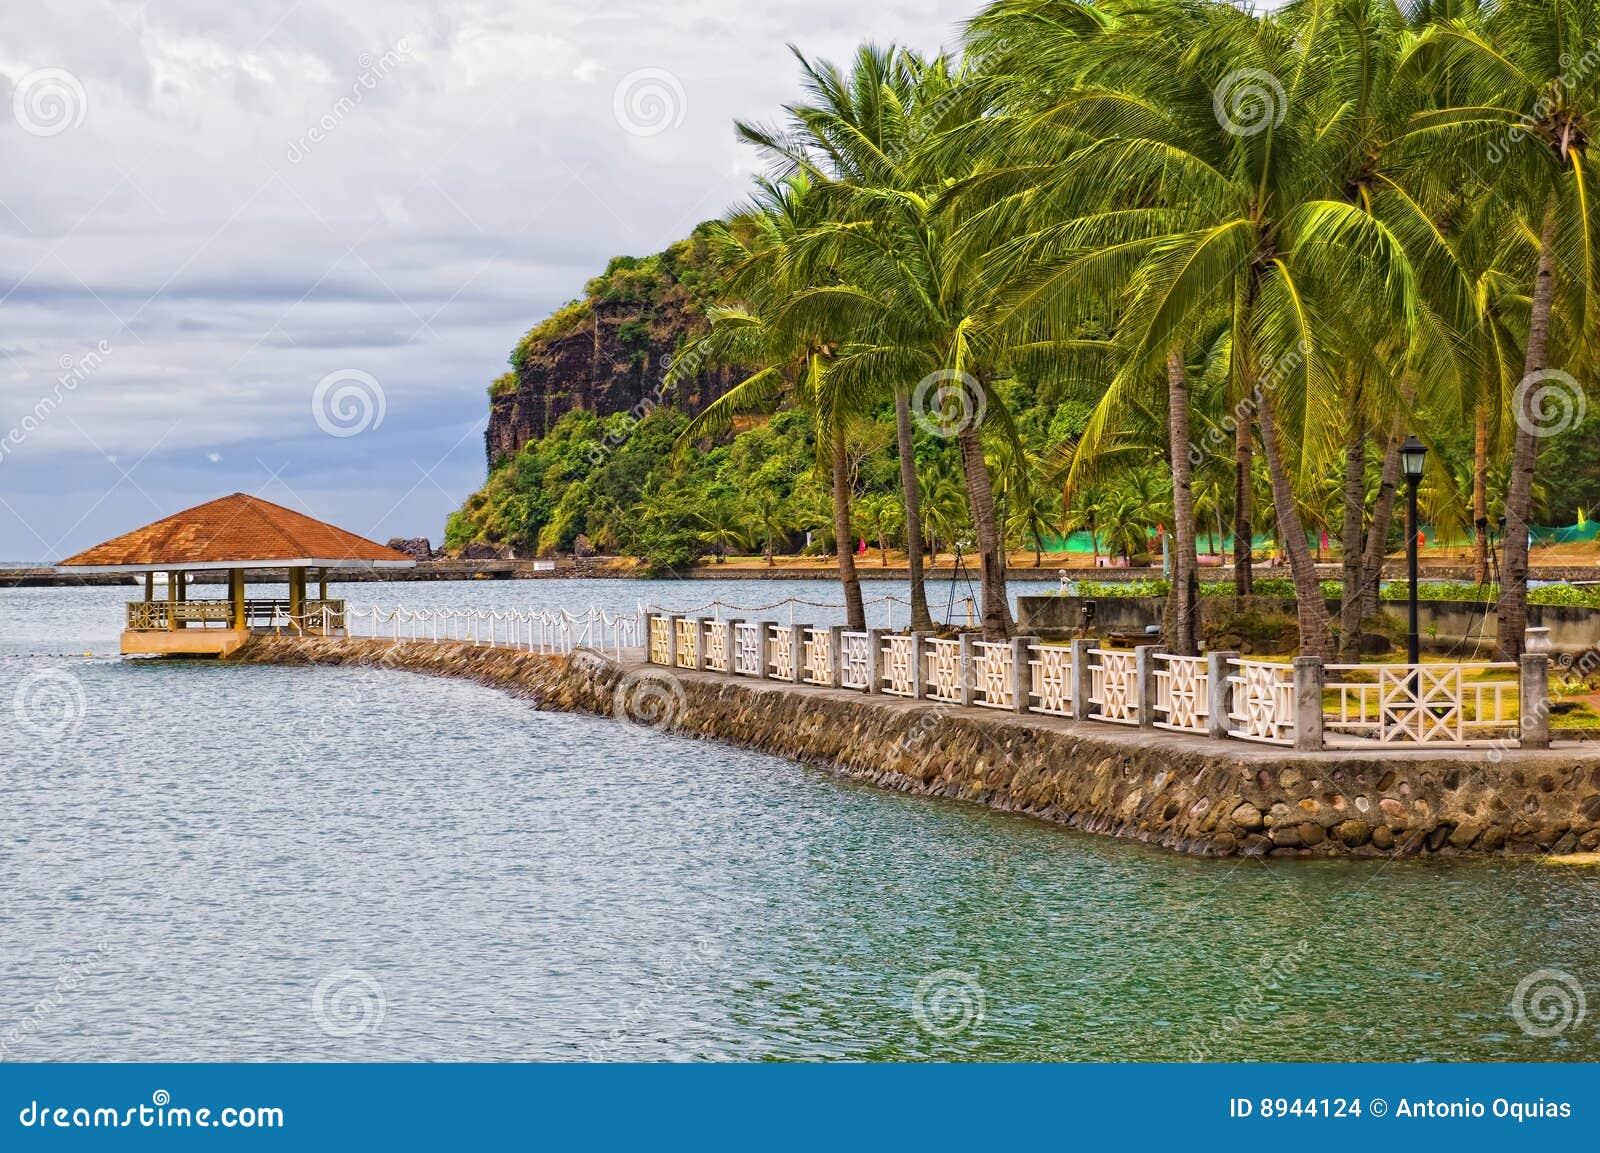 Caylabne Resort